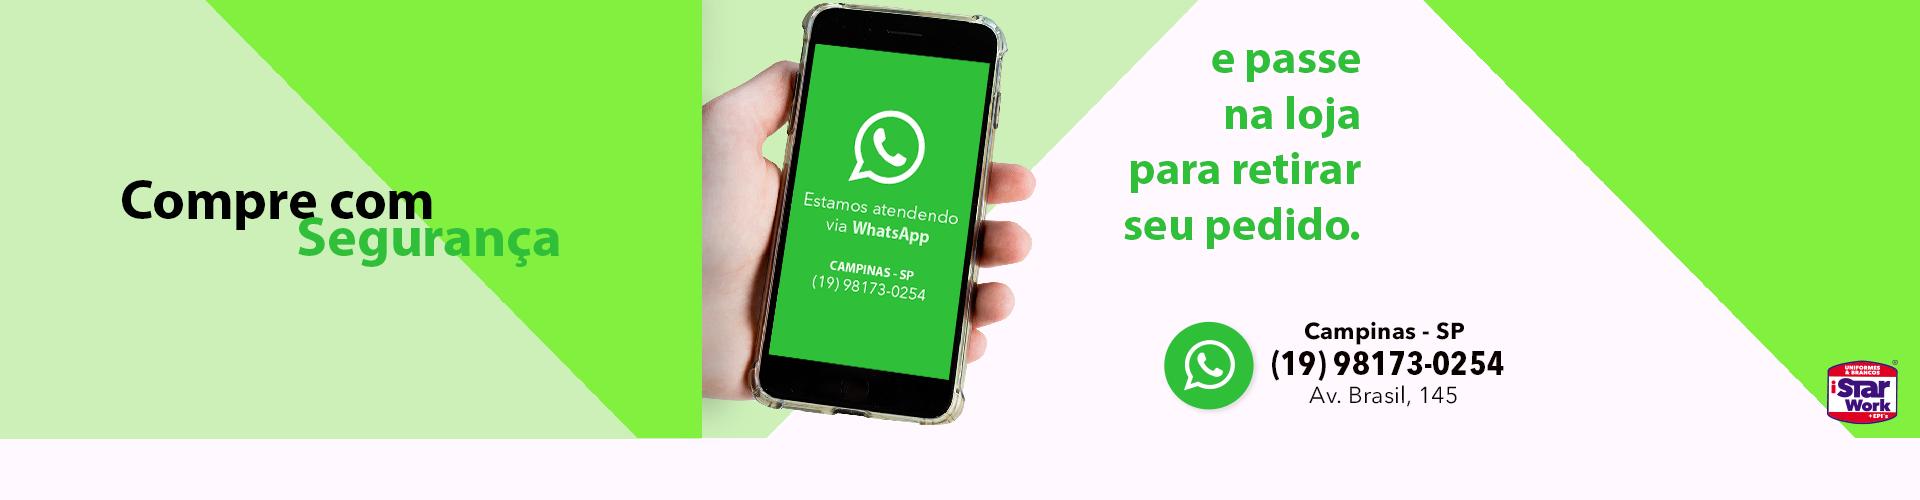 atendimento-via-whatsapp-starwork-avenidabrasil-campinassp